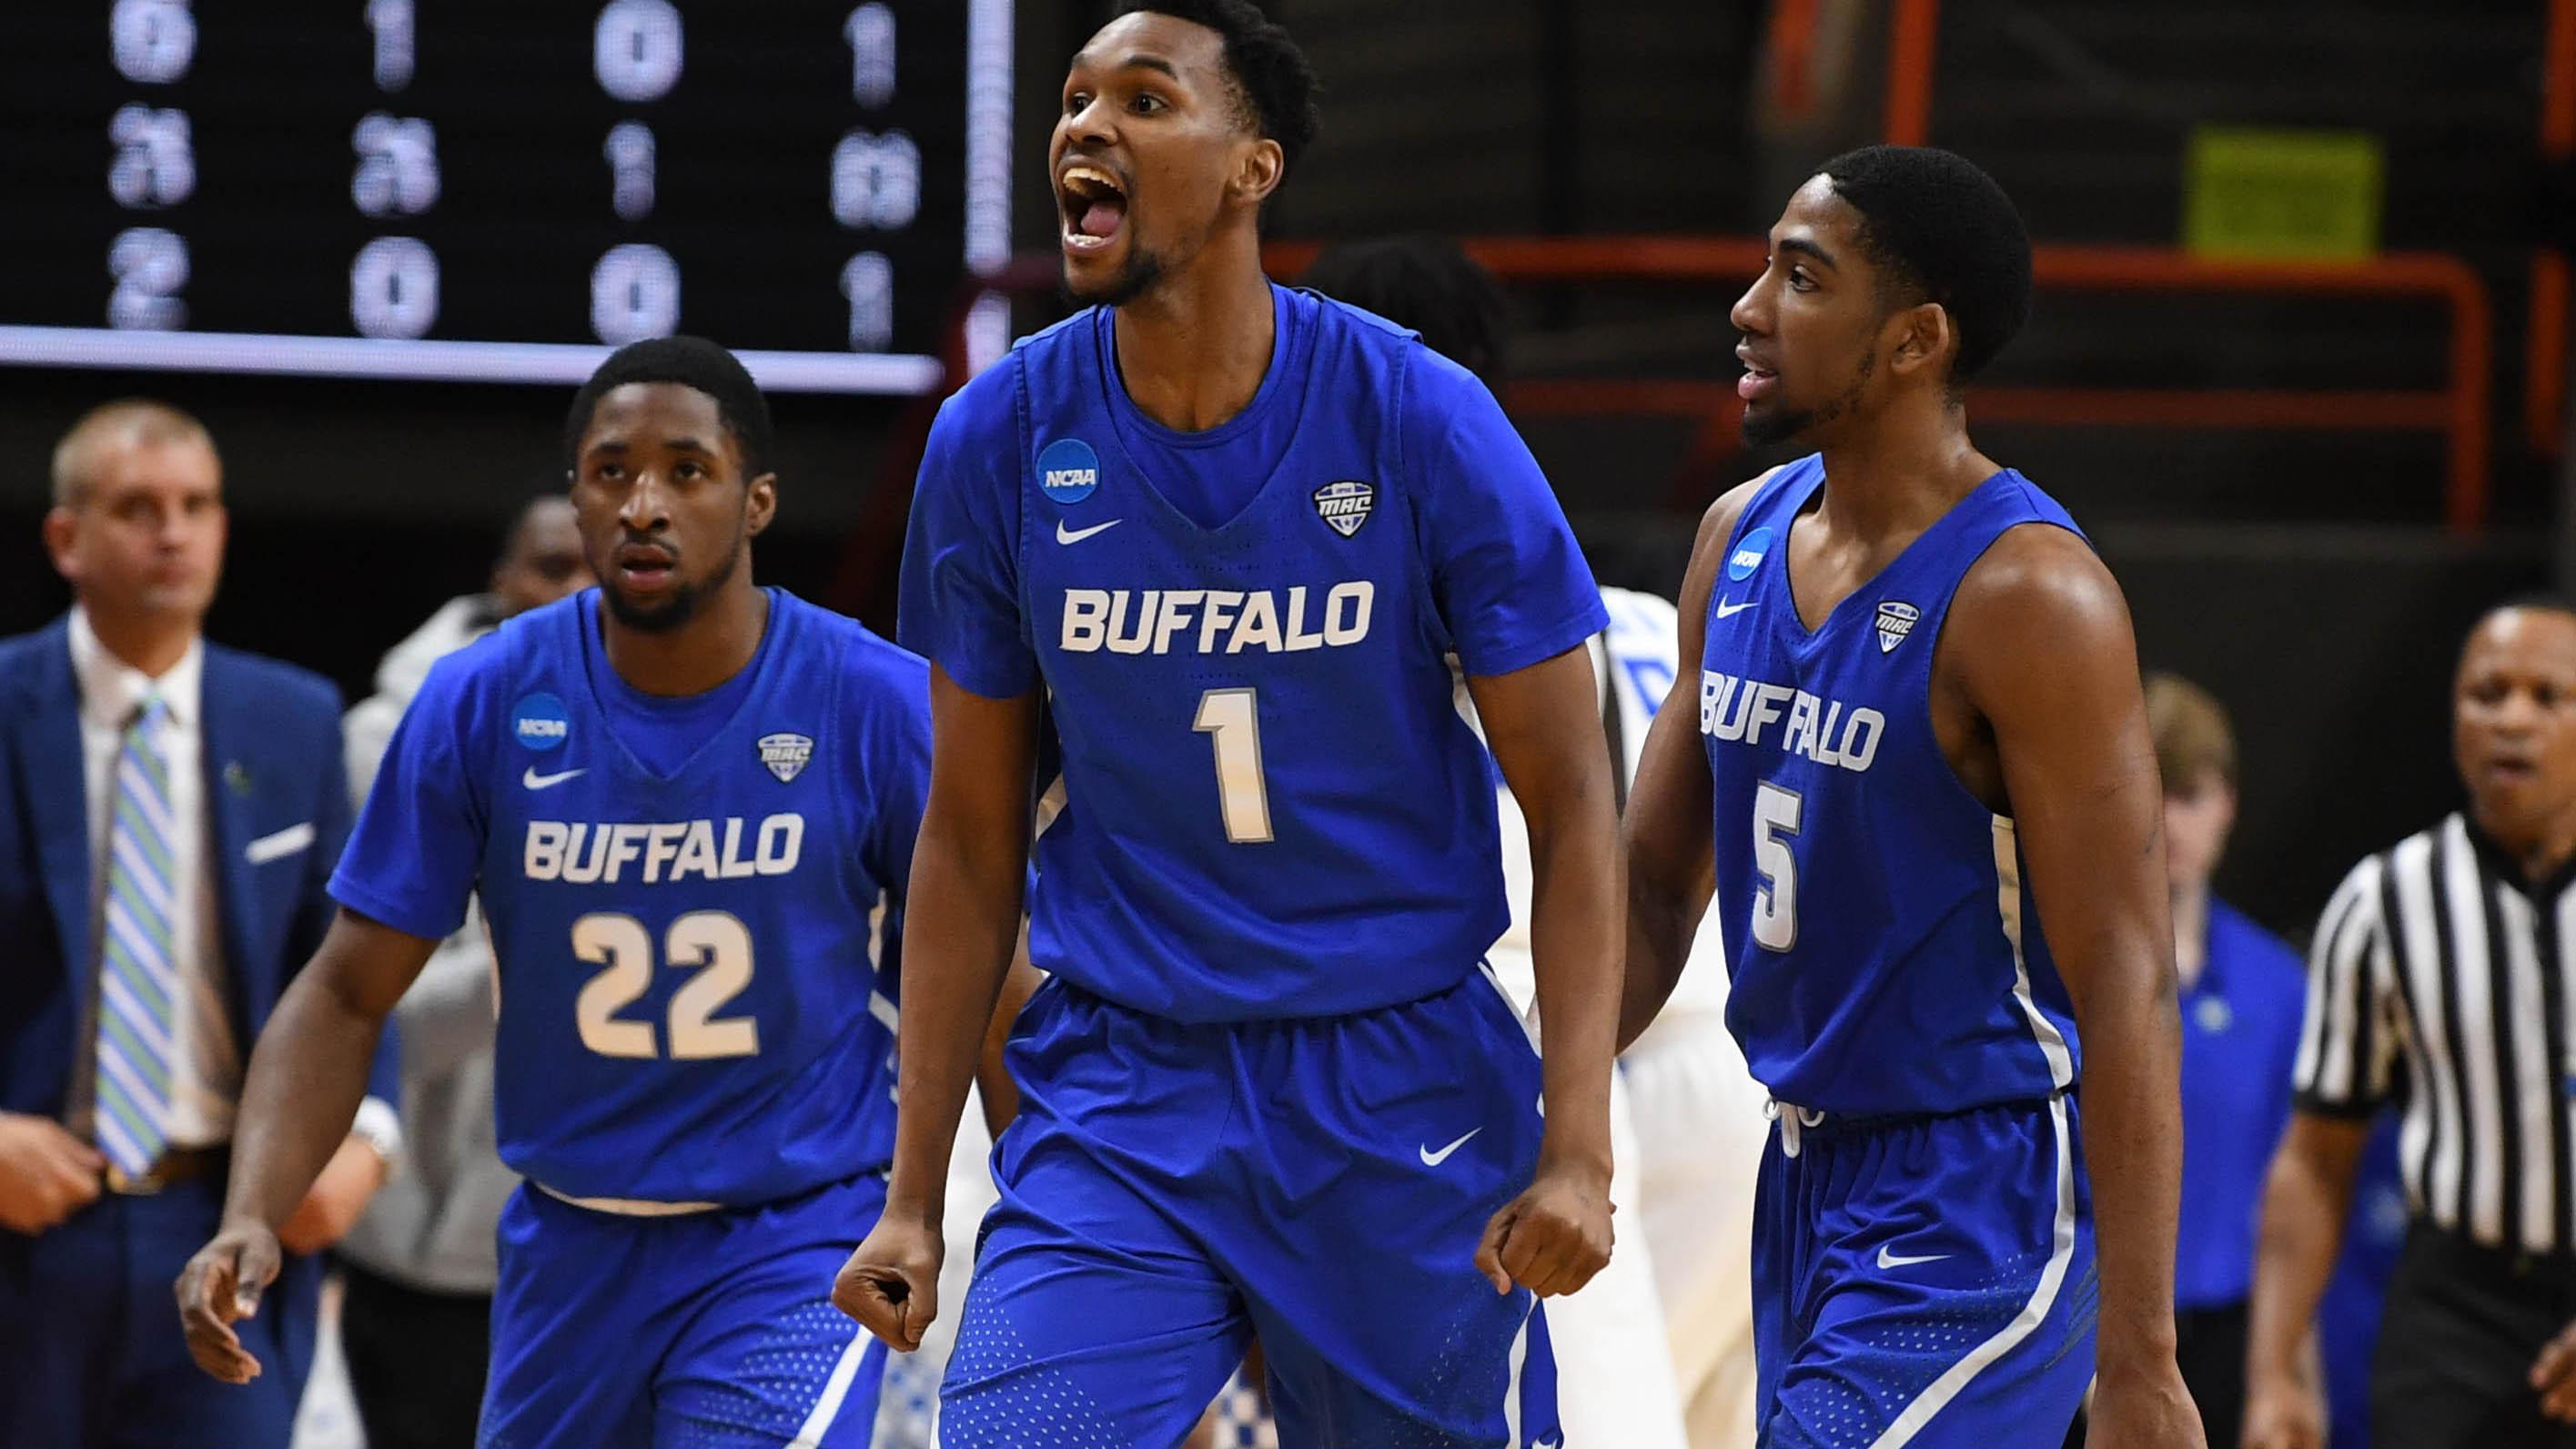 Buffalo men's basketball celebrates